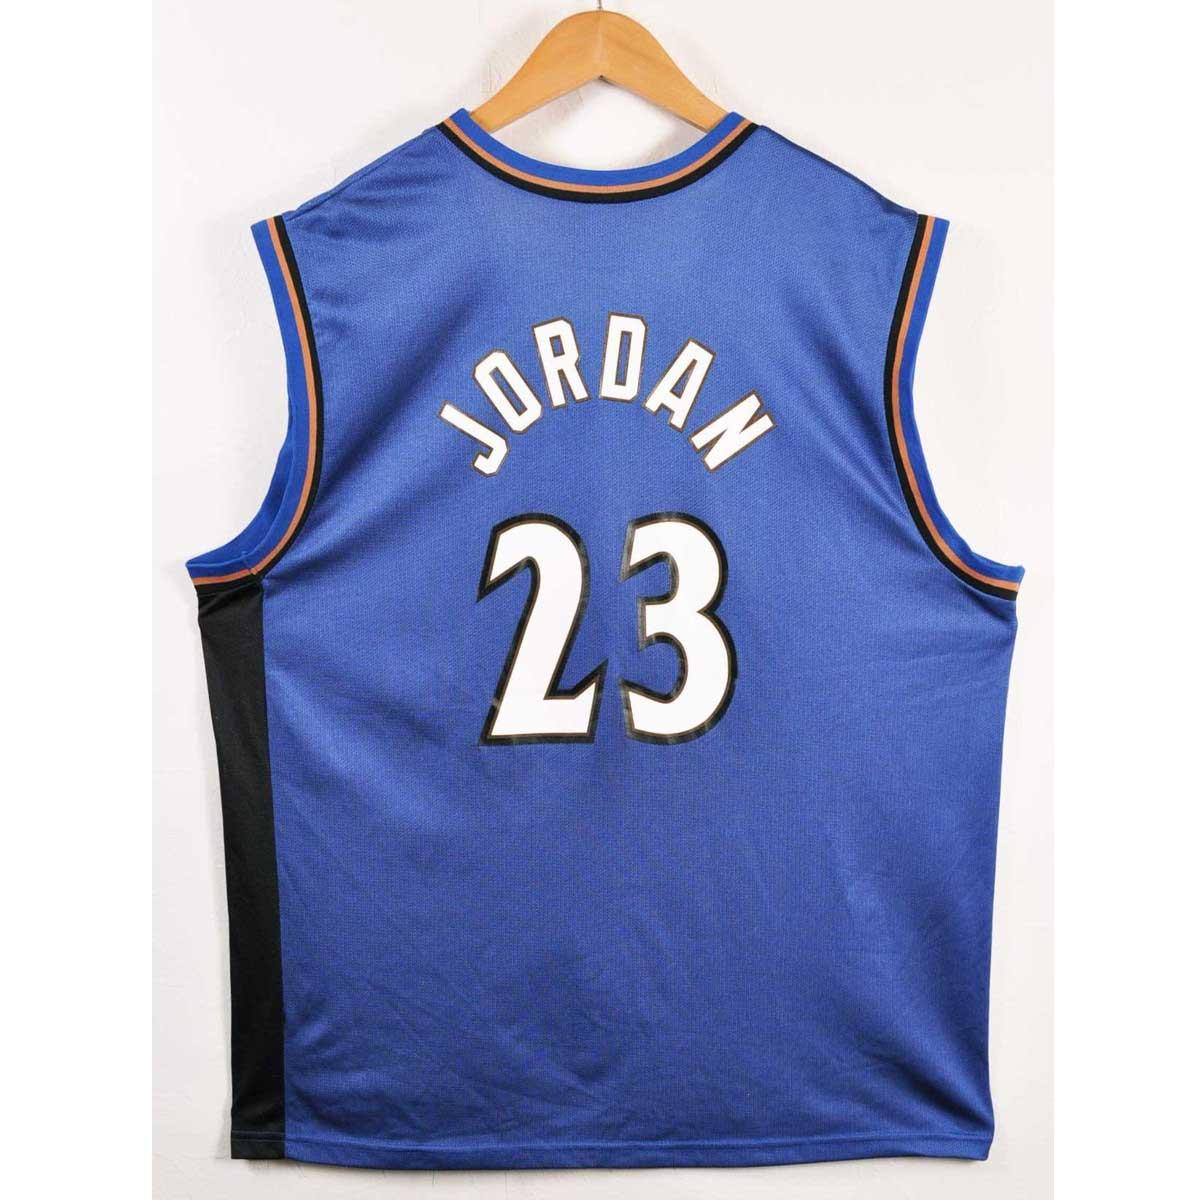 best loved 98a7b 9e4ee CHAMPION champion NBA Washington Wizards Washington Wizards Michael Jordan  basketball tank top uniform numbering dark blue men XL equivalency▼